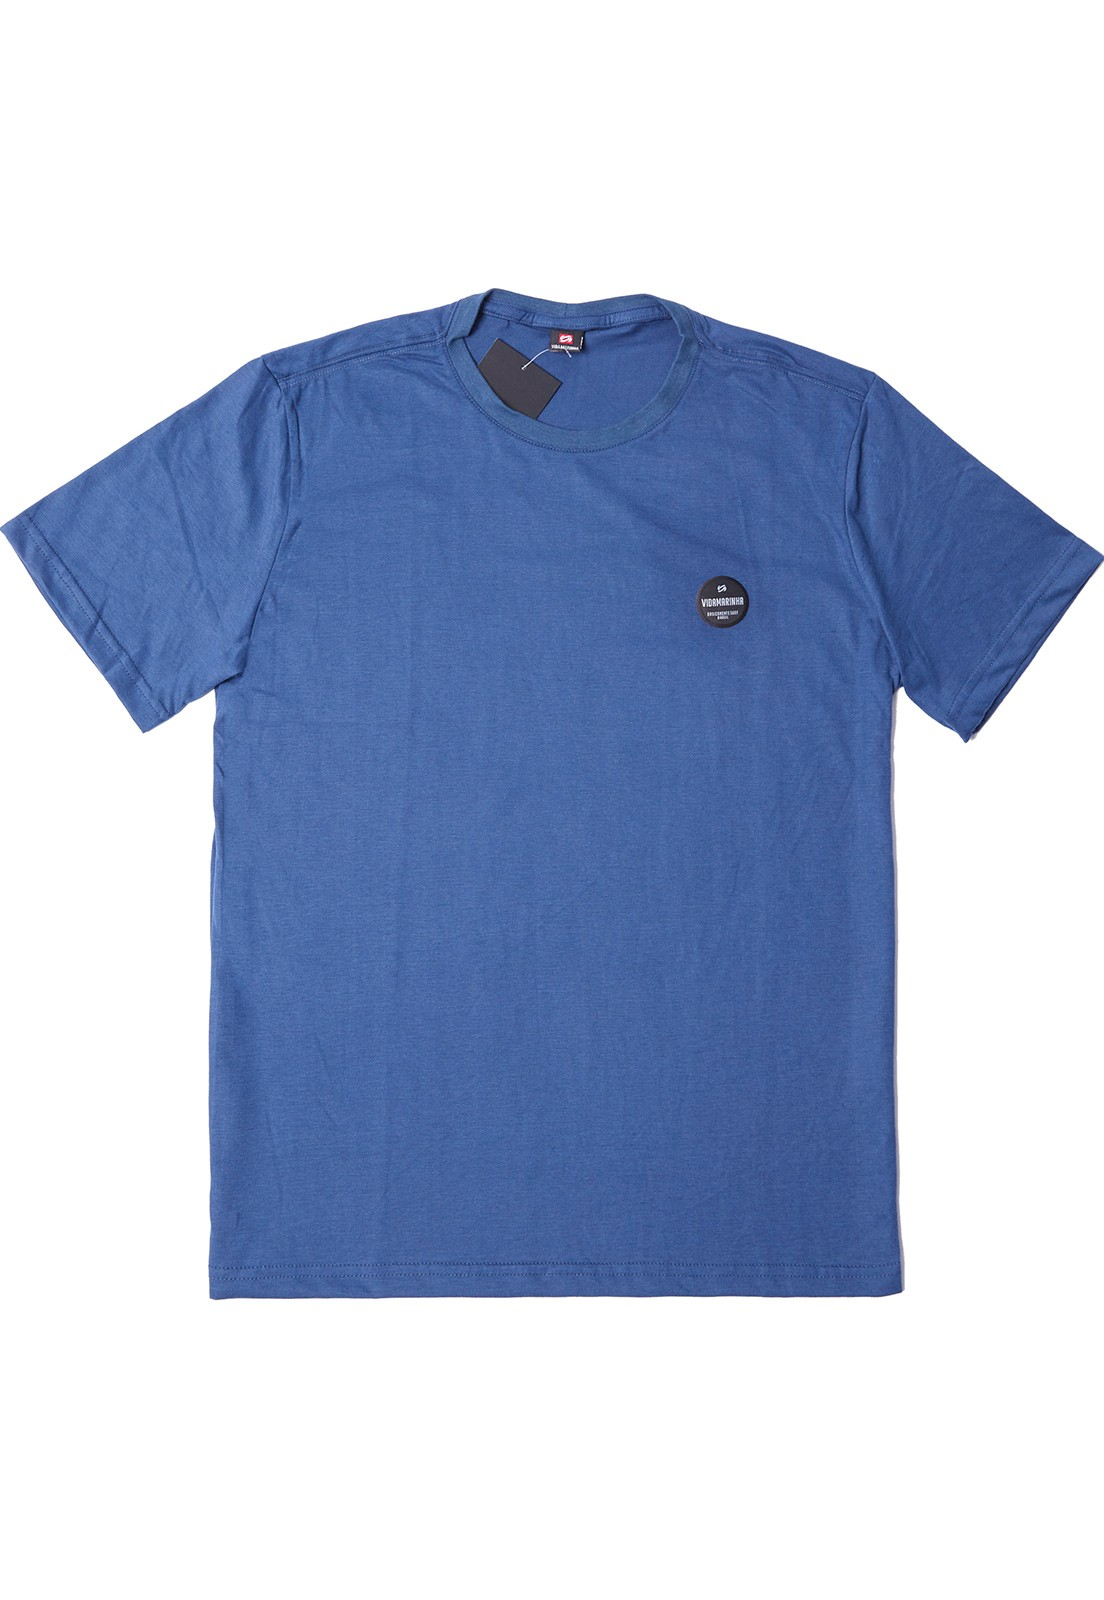 Camiseta Vida Marinha Manga Curta Básica Azul Escuro